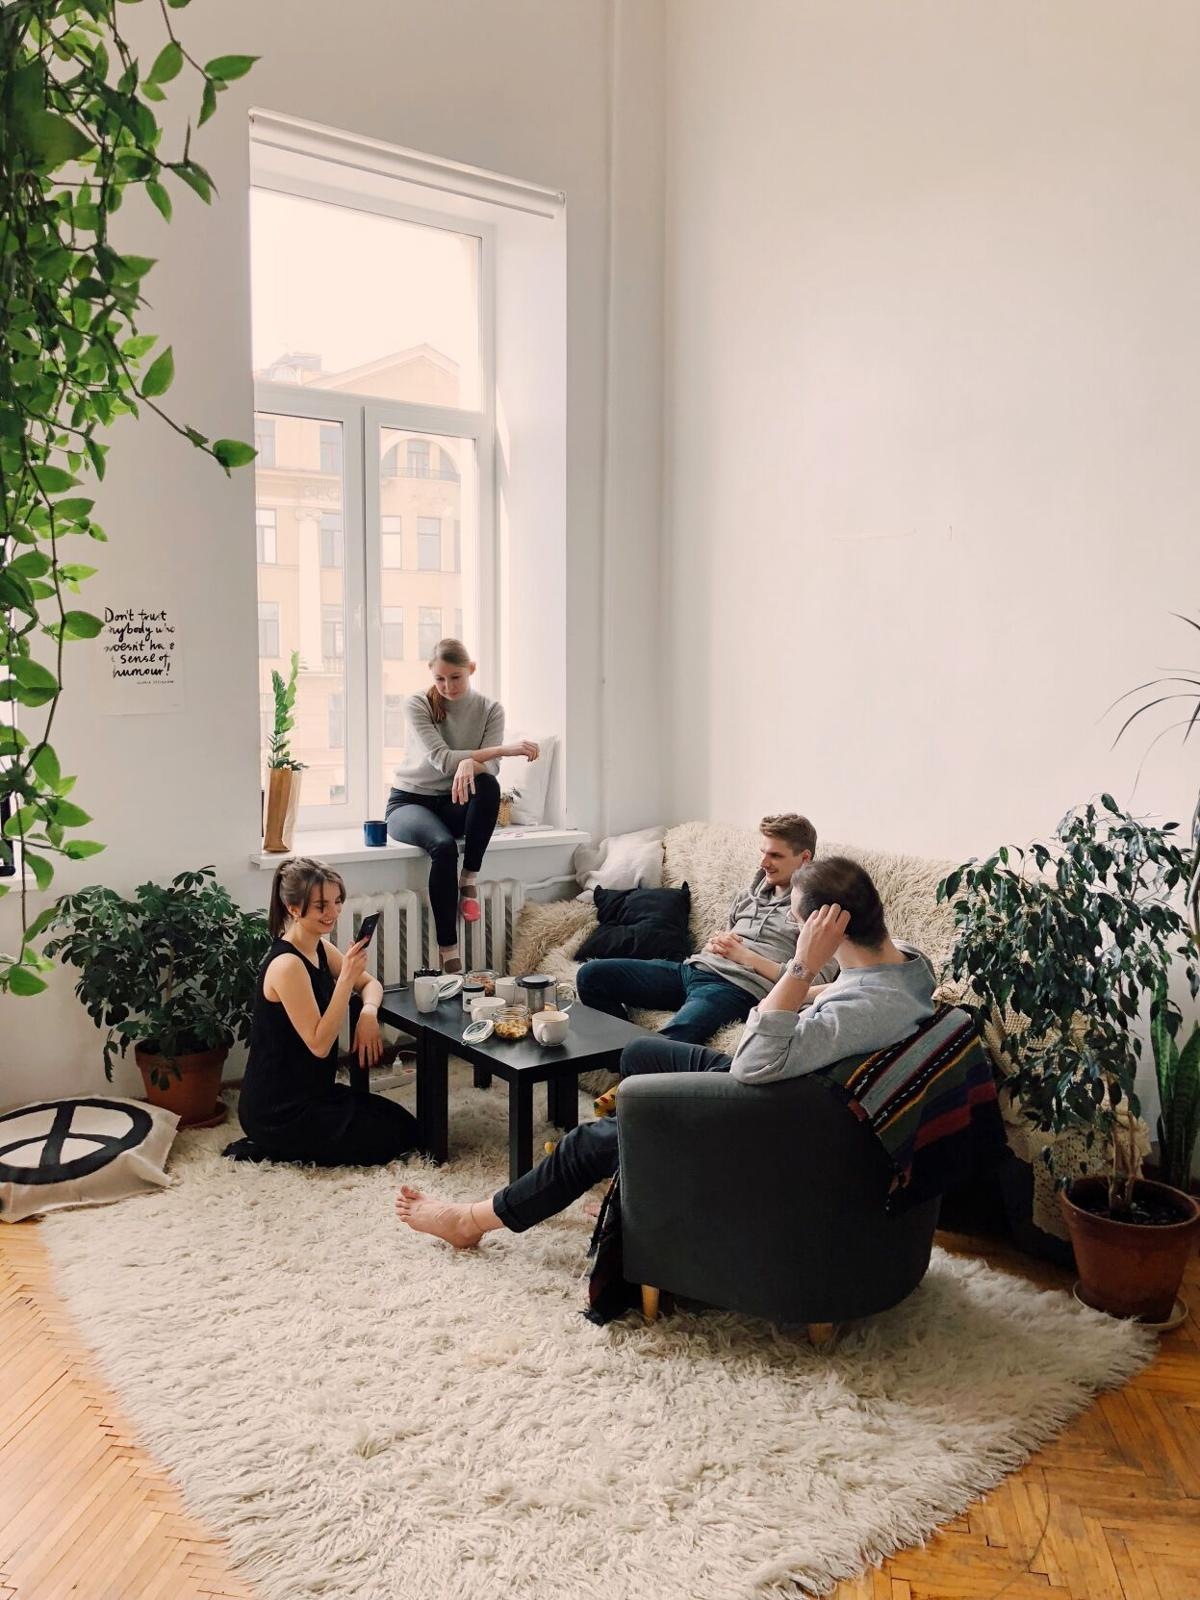 people-gathered-inside-house-sitting-on-sofa-1054974.jpg